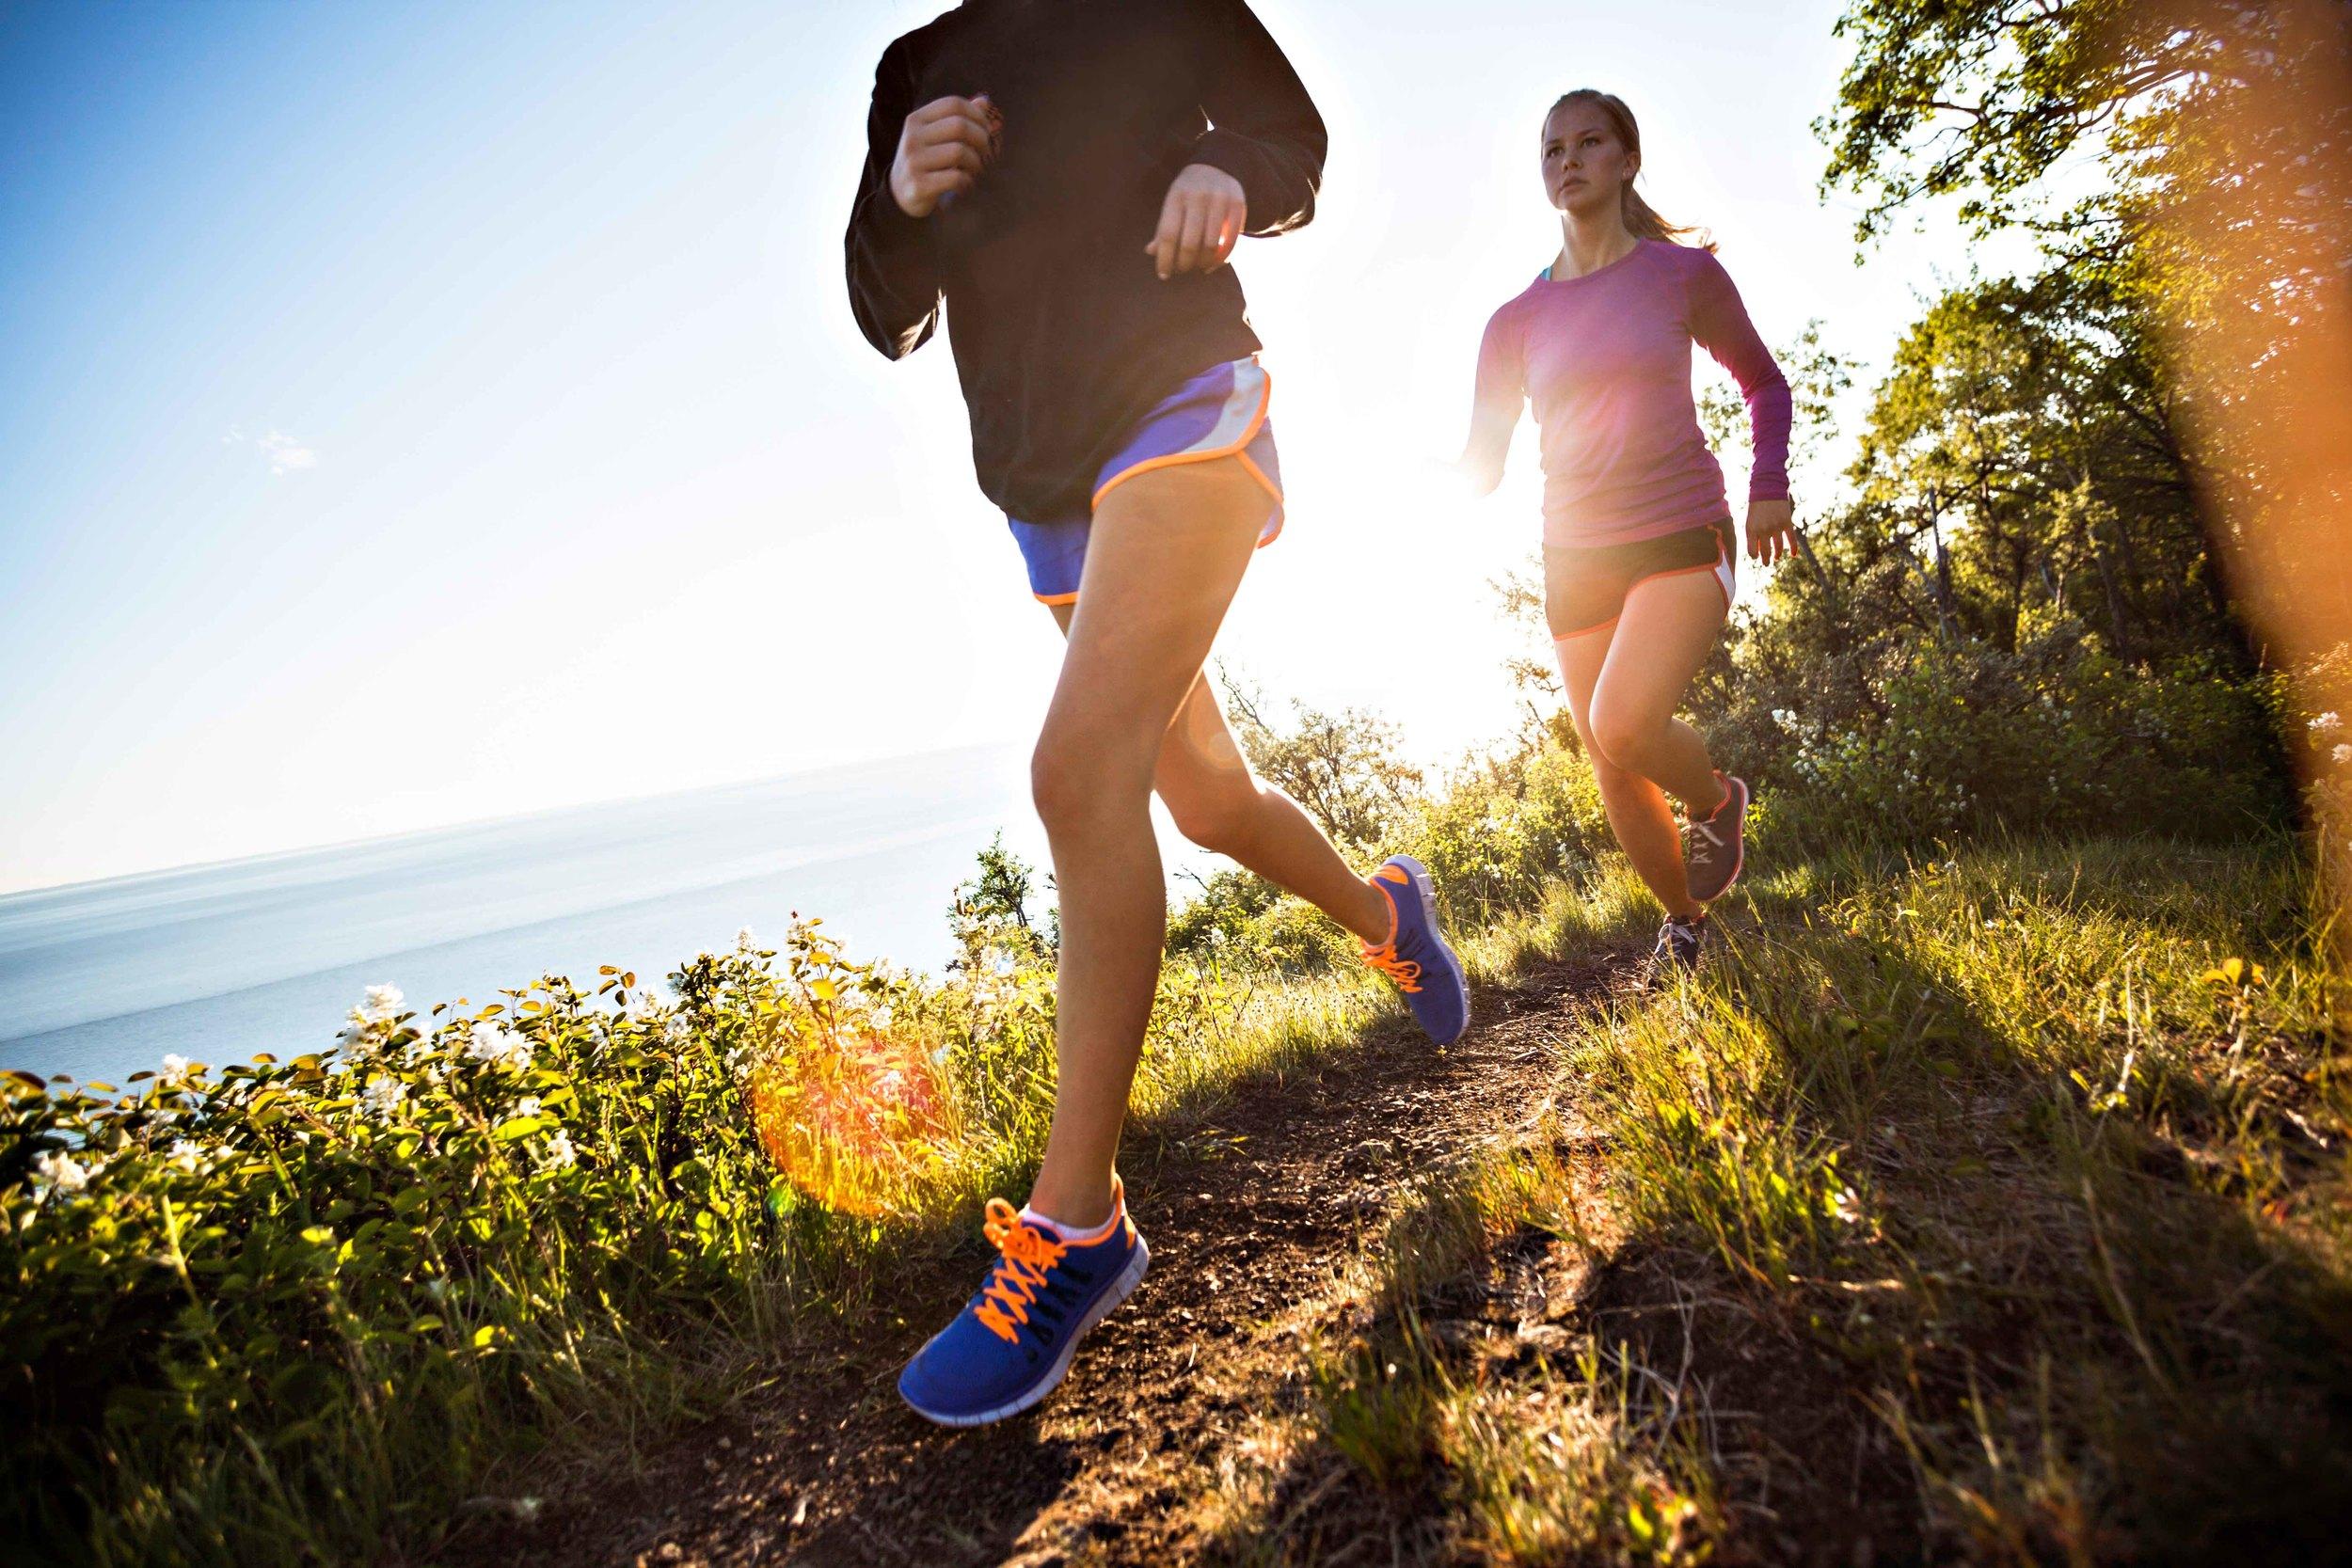 women_trailrunning-1-2.jpg